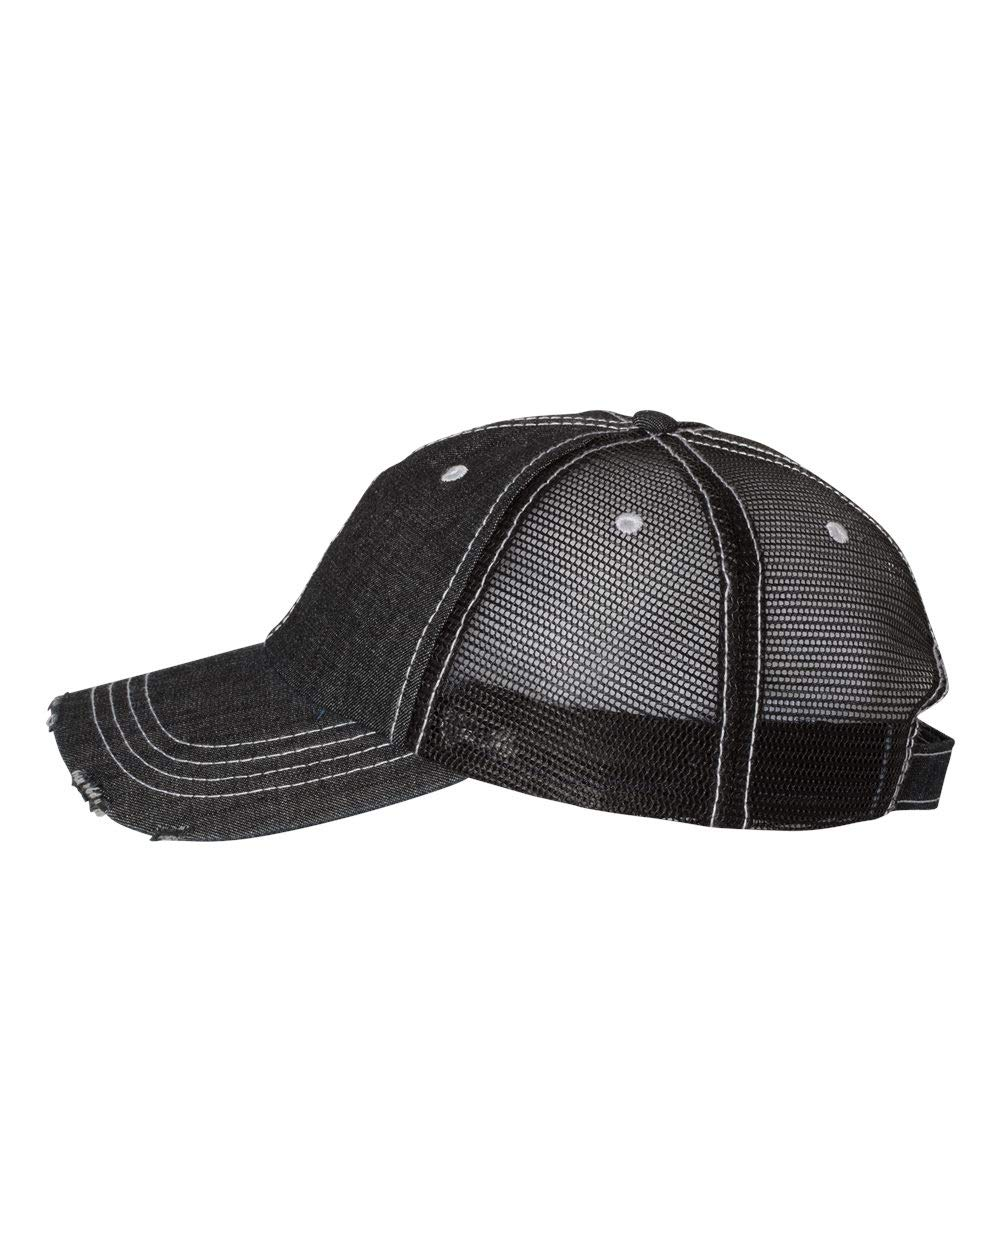 Wrestling Mom Cap Sparkling Bling Sport Custom Womens Rhinestone and Glitter Baseball Hat ALWAYS FREE SHIPPING